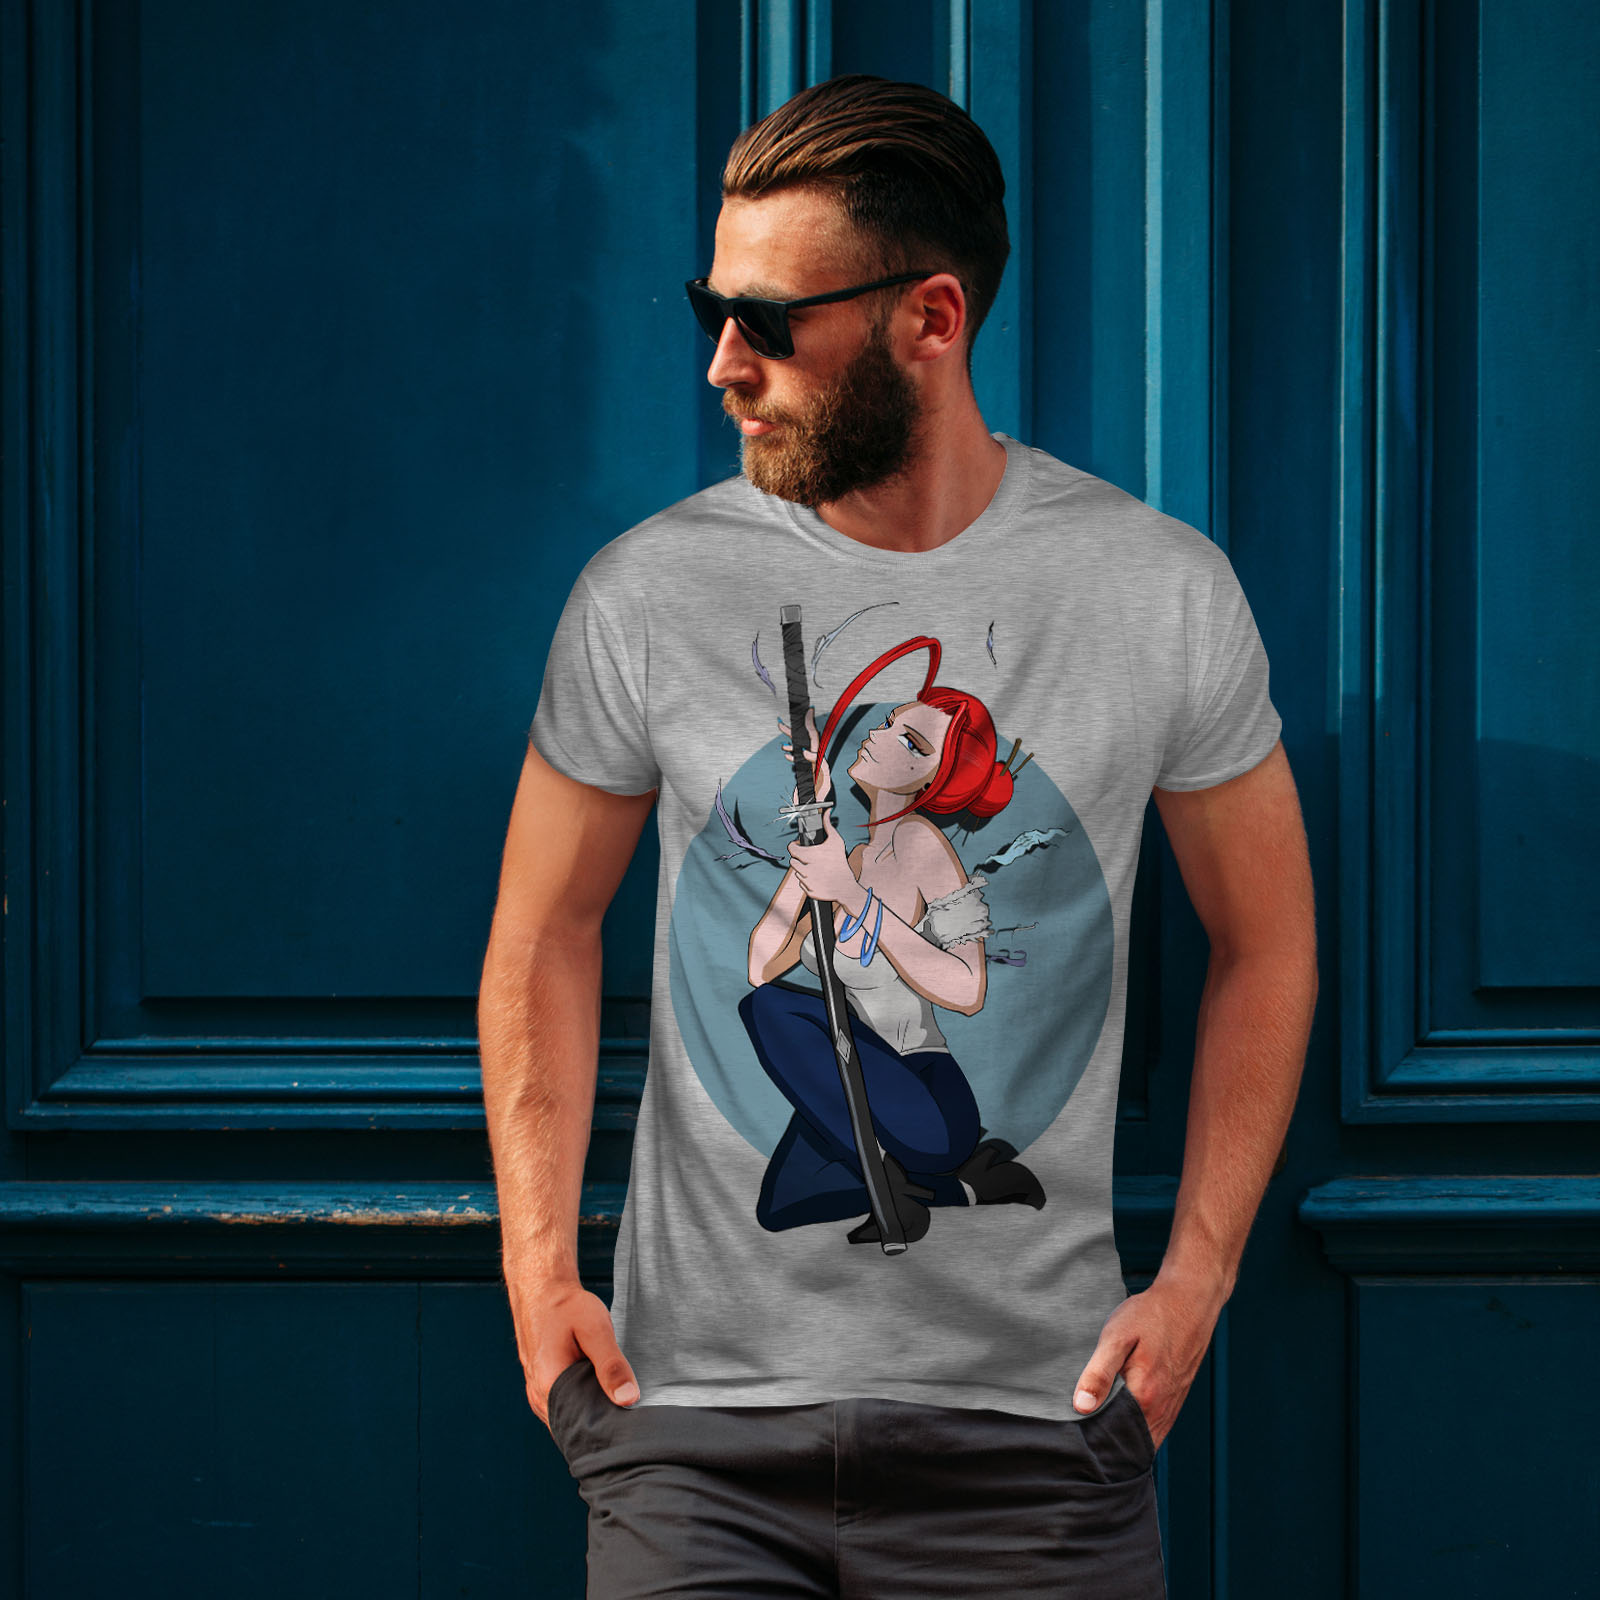 Wellcoda-Anime-Katana-Girl-Mens-T-shirt-Japanese-Graphic-Design-Printed-Tee thumbnail 16